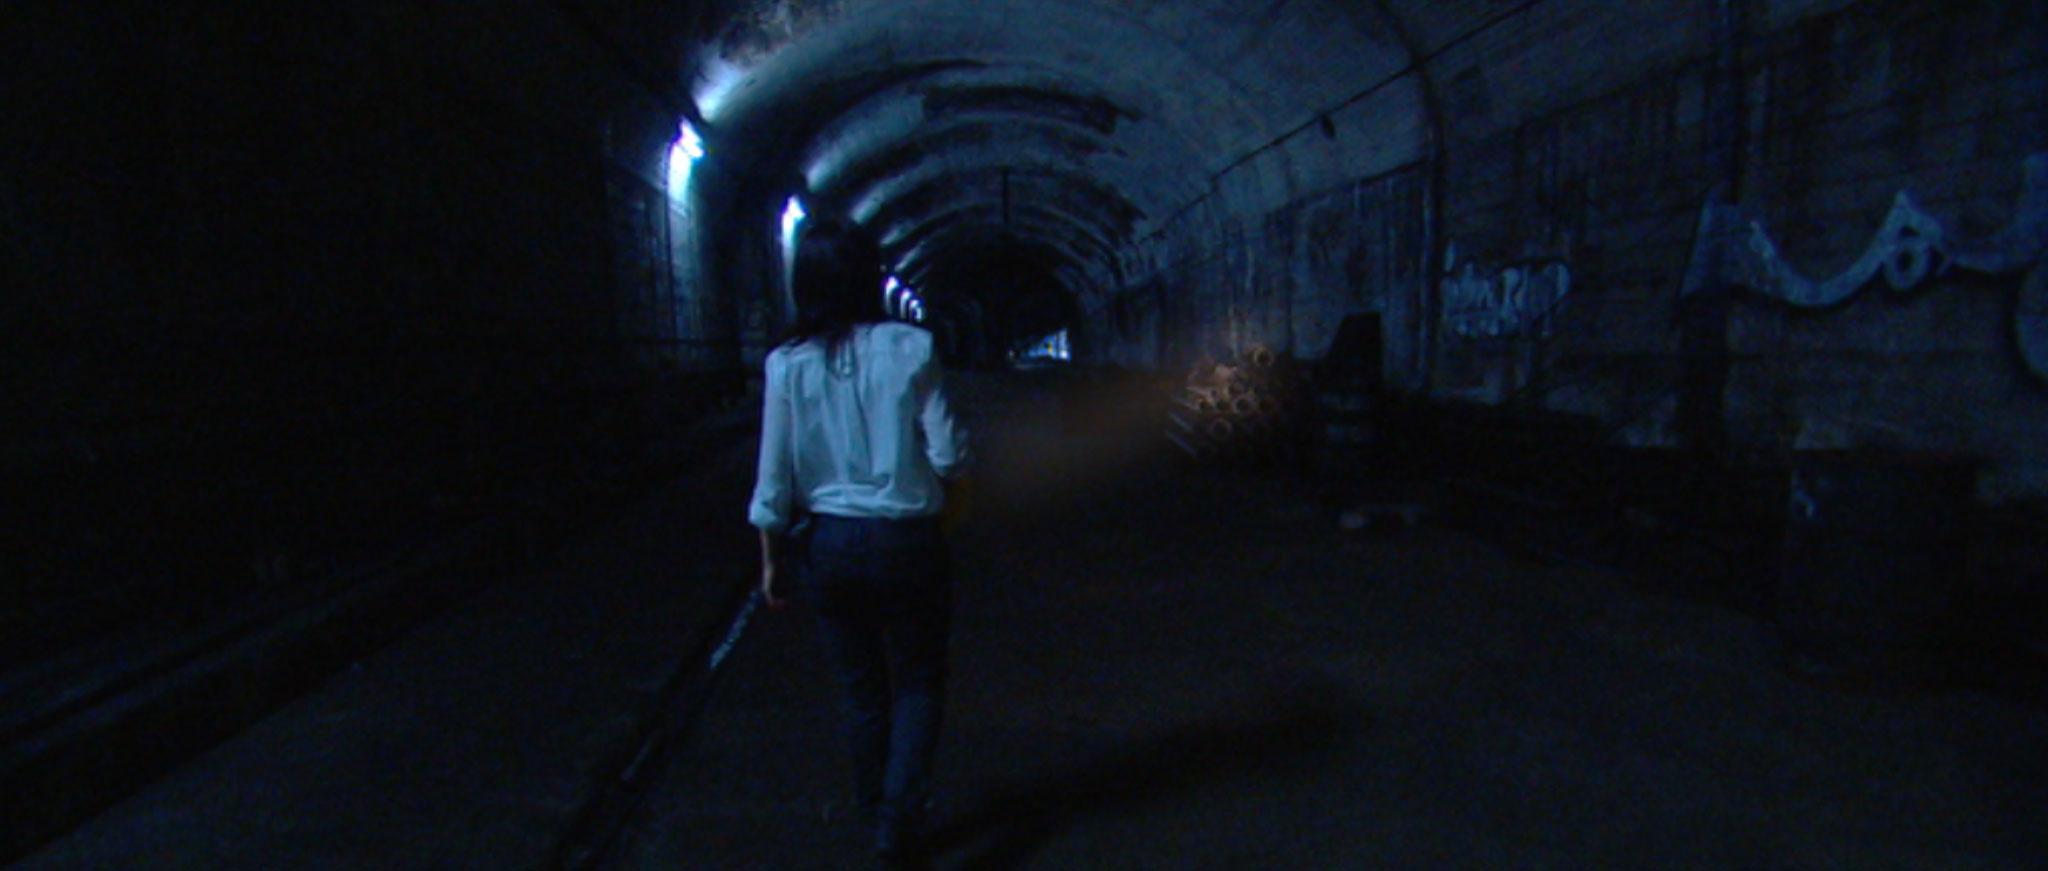 The-Tunnel-2k_045167.jpg